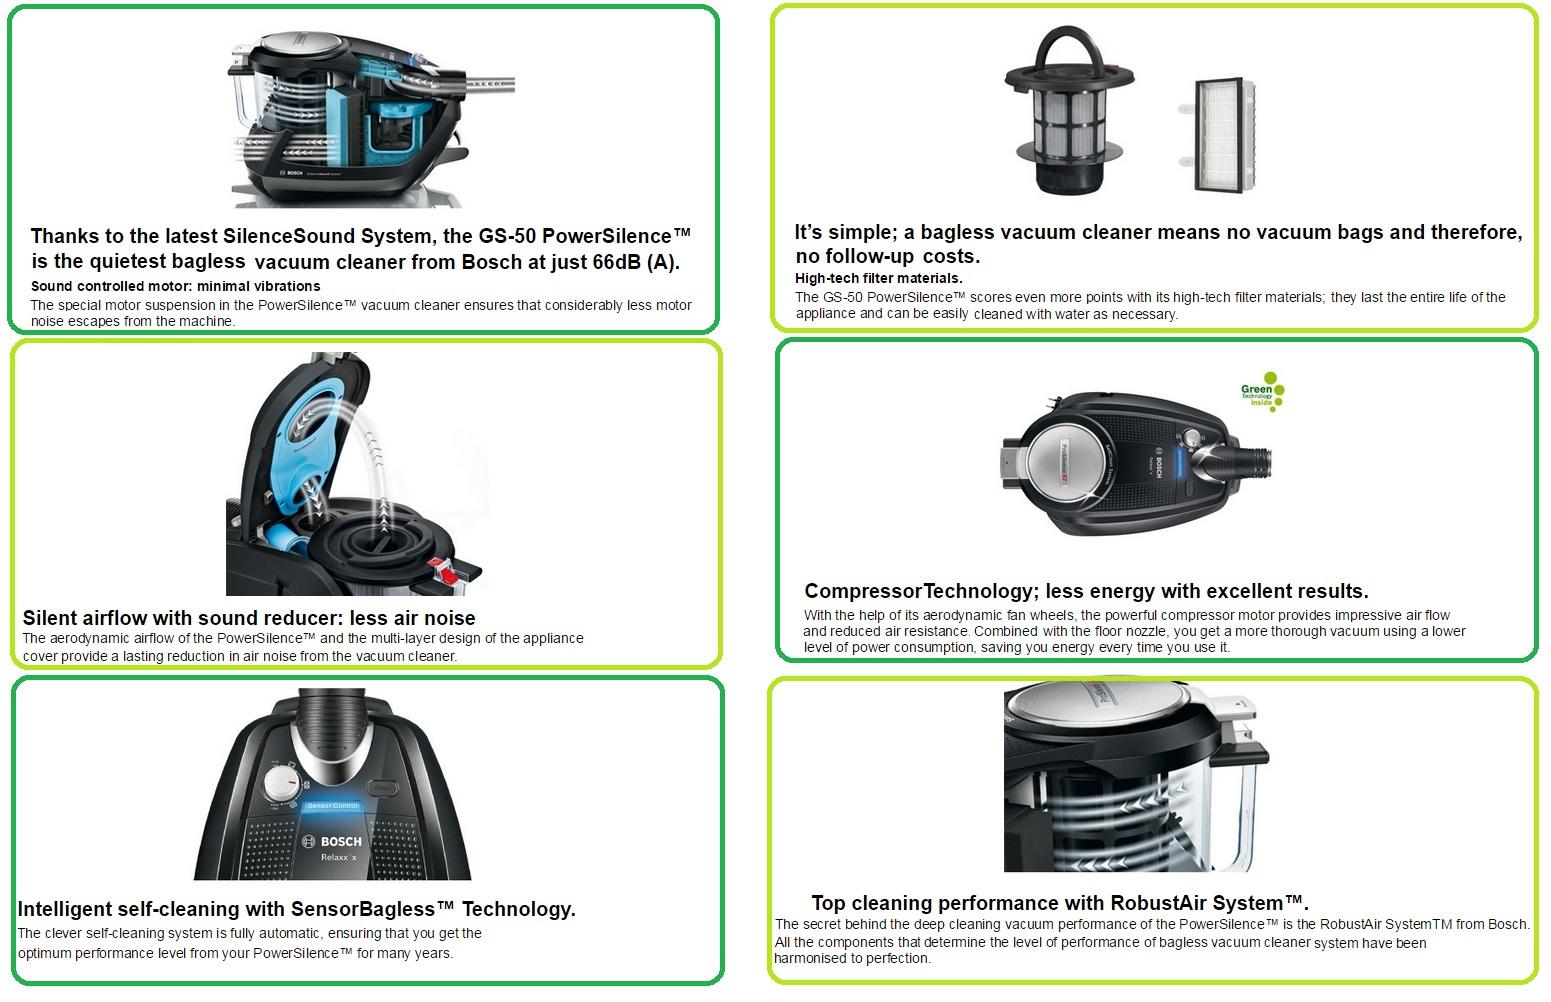 Bosch Gs50 Power Silence 2 Bagless Vacuum Cleaner